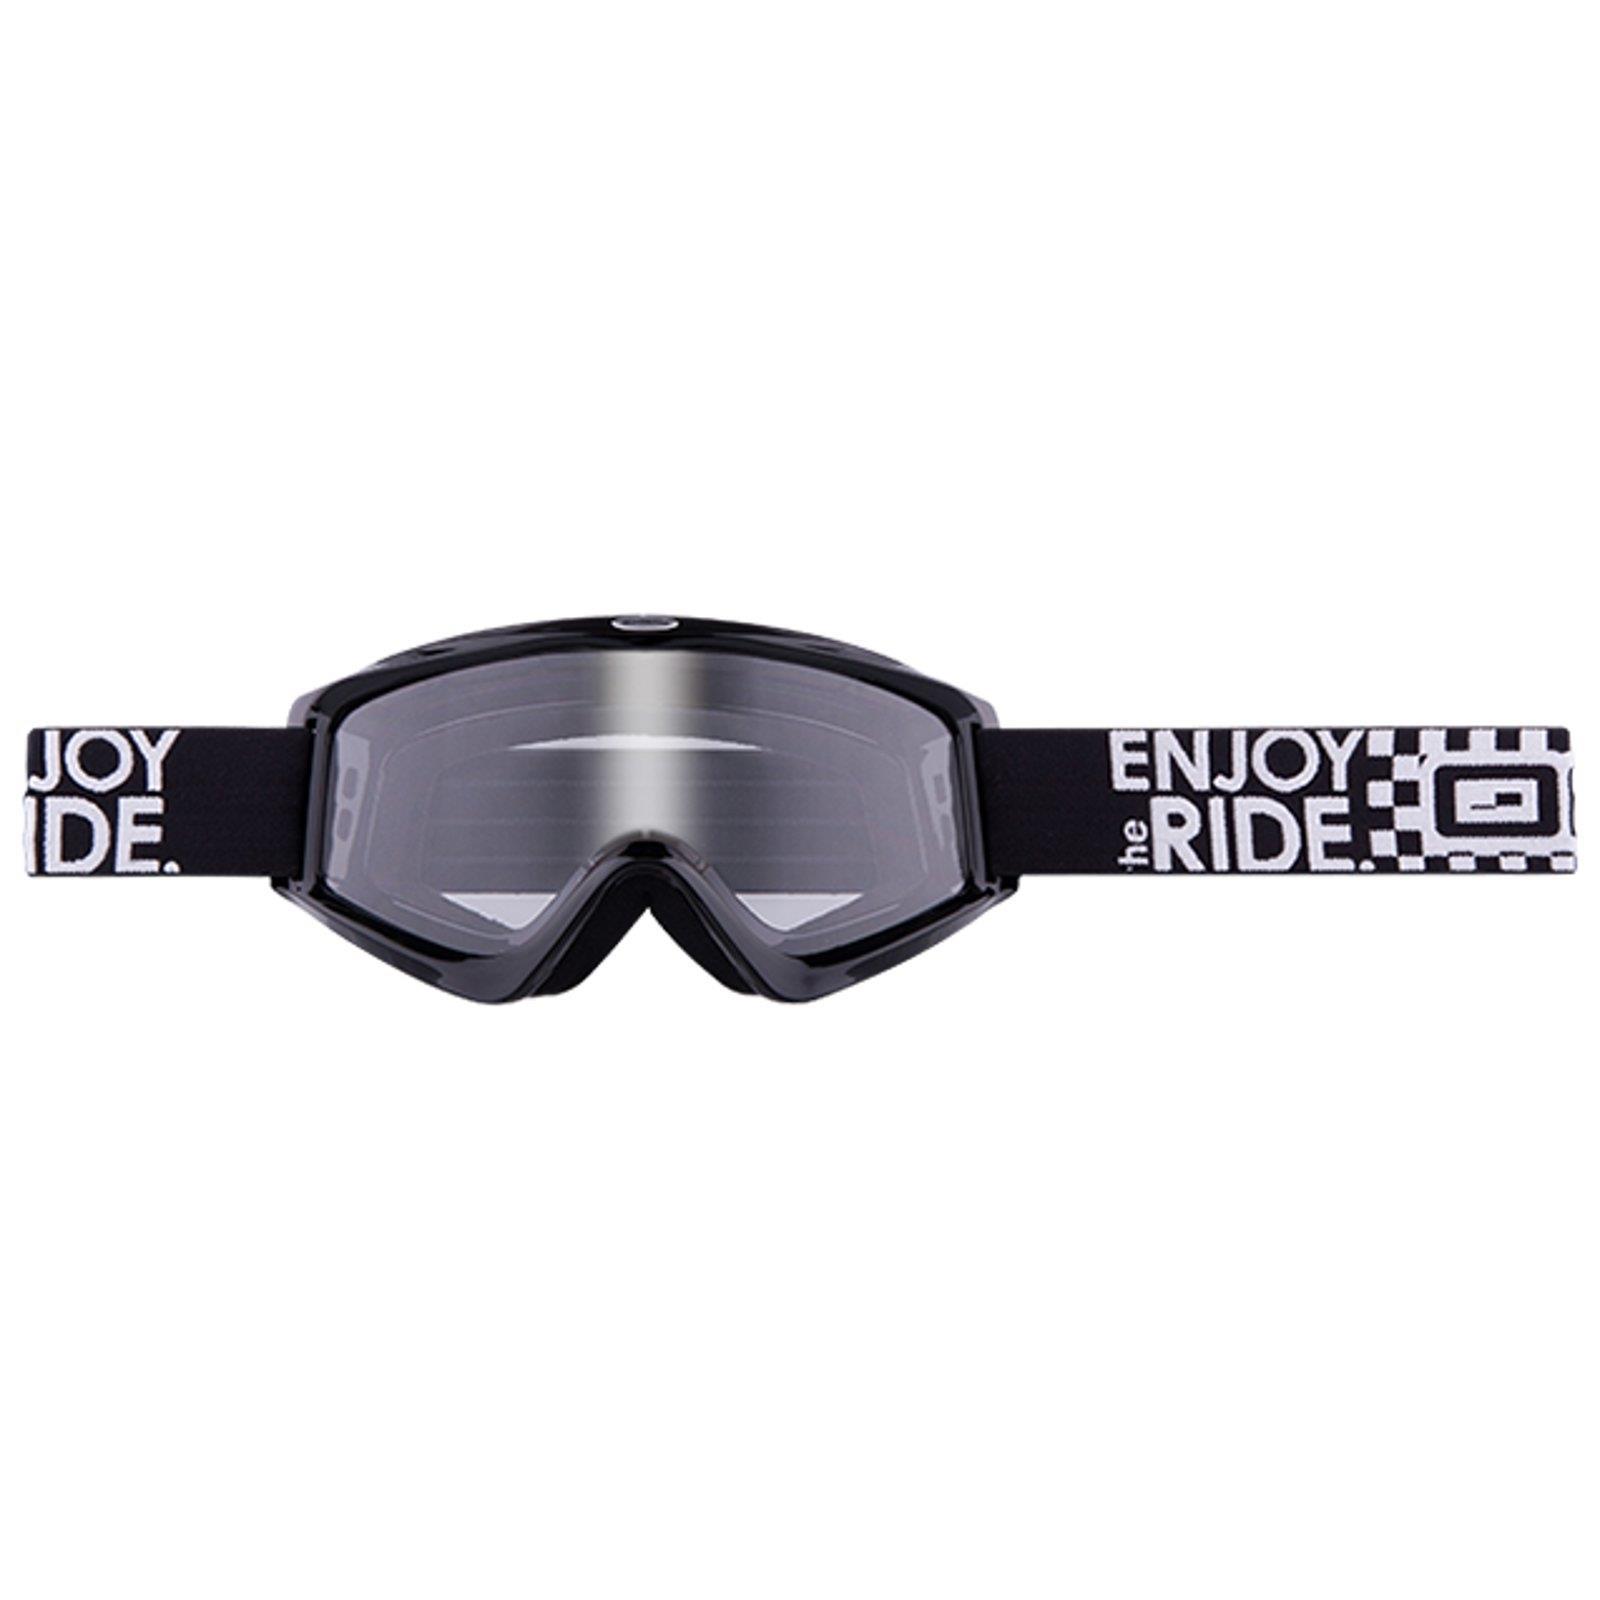 ONeal-B-ZERO-Goggle-MOTOCROSS-DOWNHILL-CROSS-MX-Occhiali-DH-ENDURO-Bzero-MOTO miniatura 10